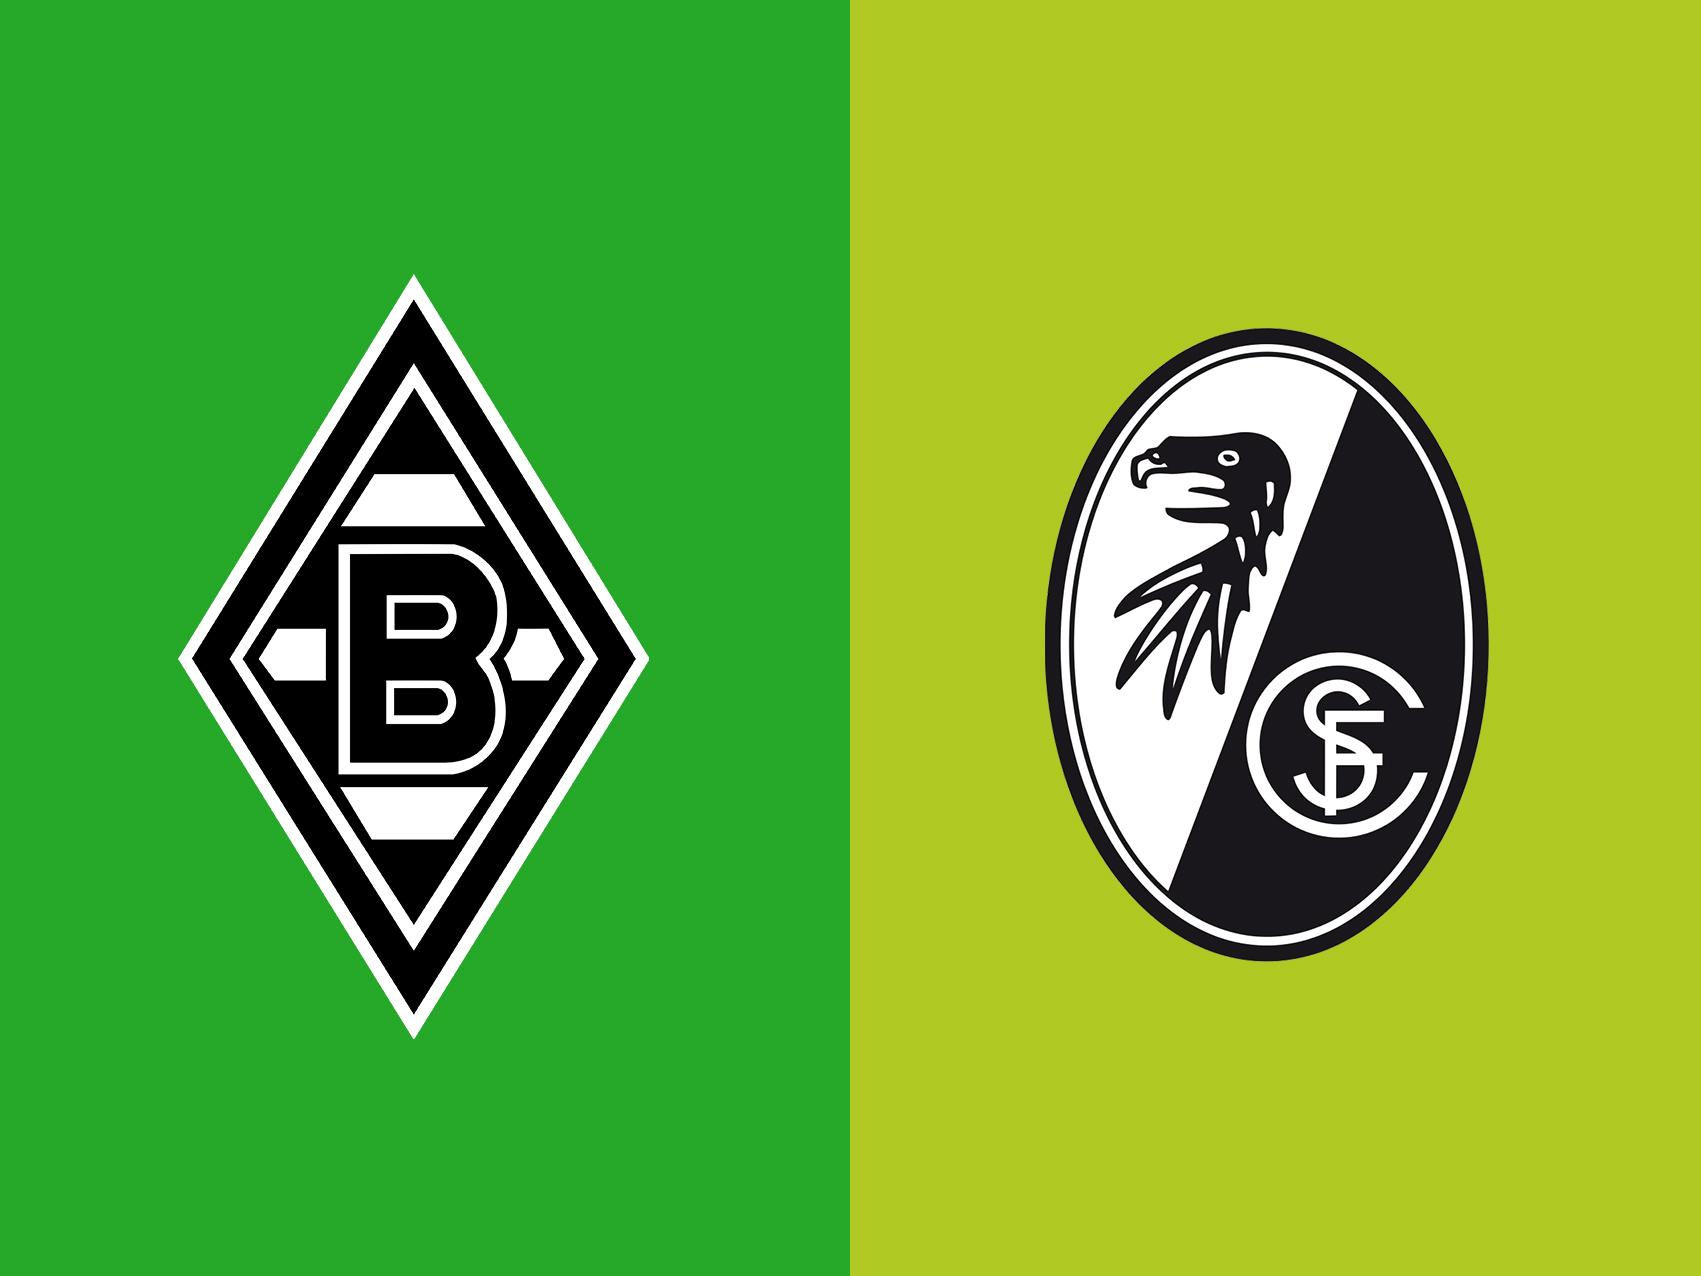 soi-keo-ca-cuoc-bong-da-ngay-16-3-borussia-monchengladbach-vs-freiburg-chu-ap-dao-khach-b9 1